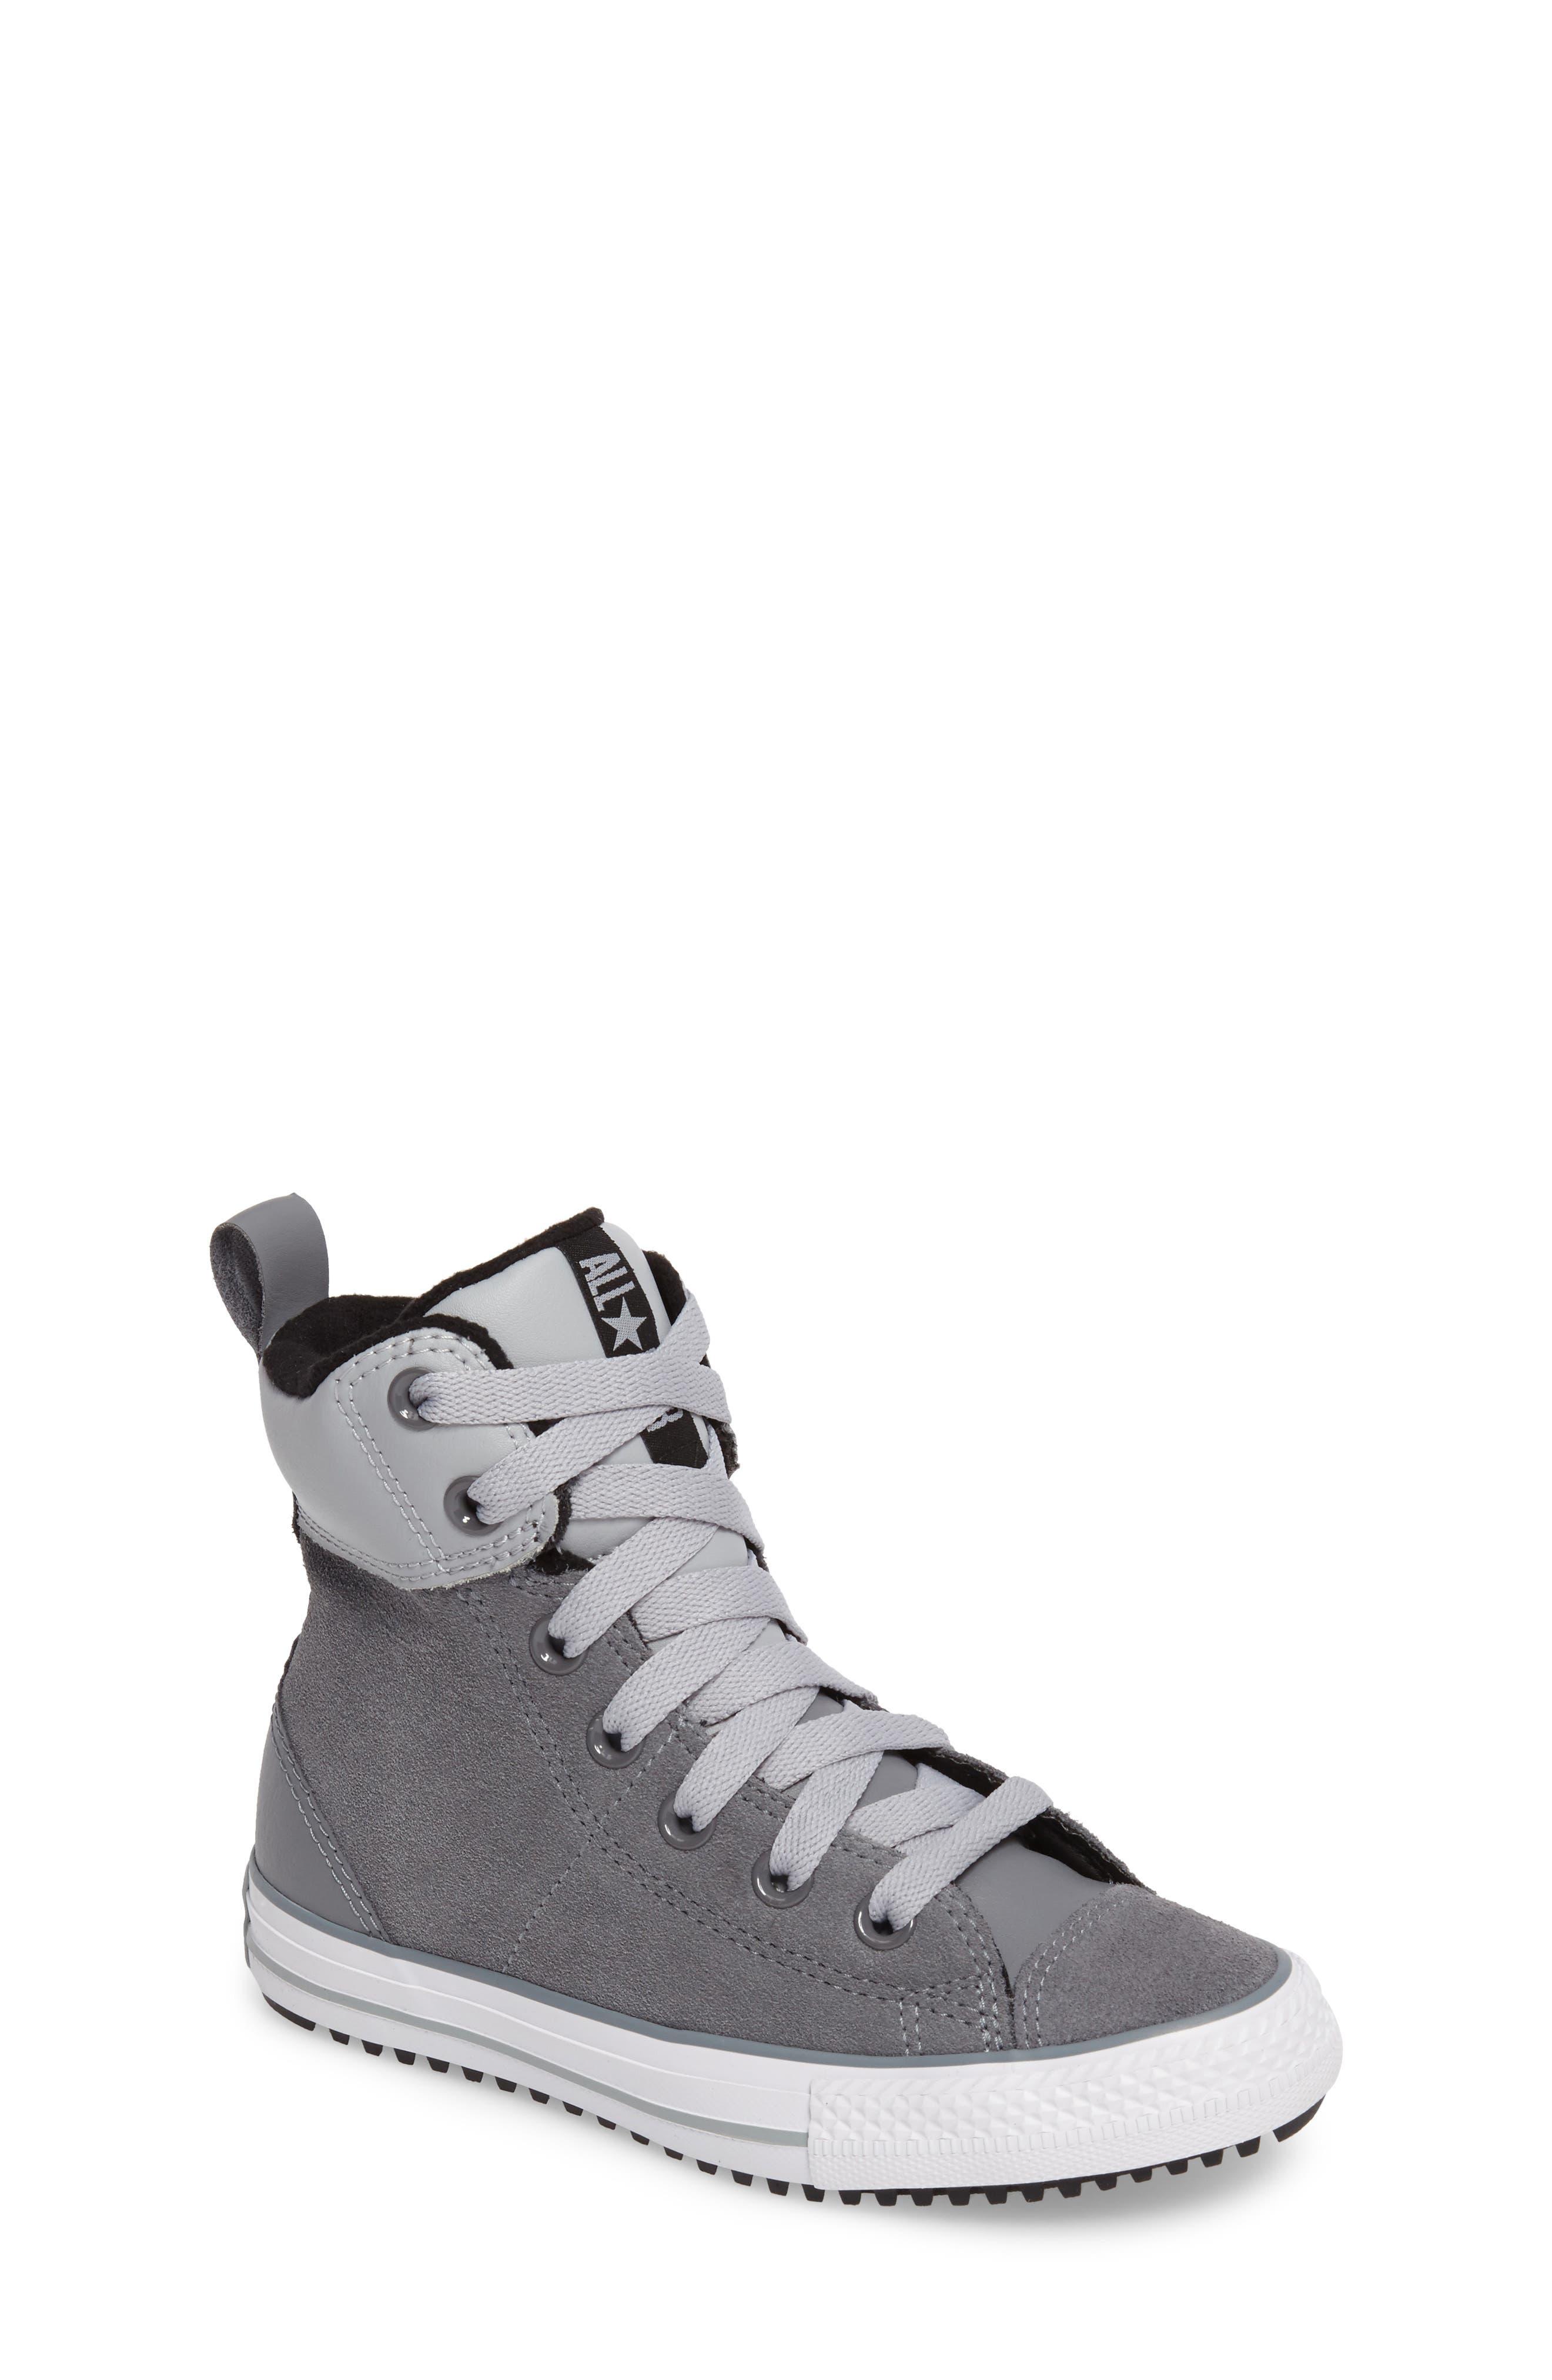 Chuck Taylor<sup>®</sup> All Star<sup>®</sup> Asphalt Sneaker Boot,                             Main thumbnail 1, color,                             039